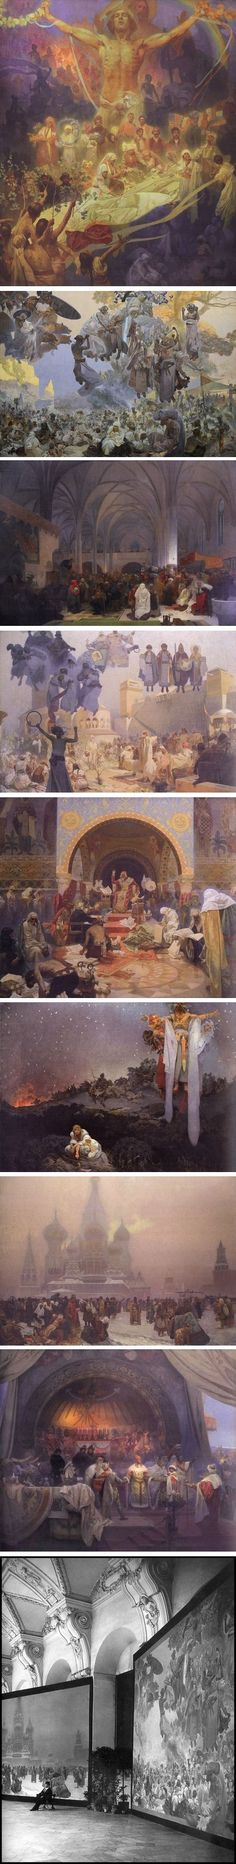 The Slav Epic, Alphonse Mucha (Alfons Mucha)